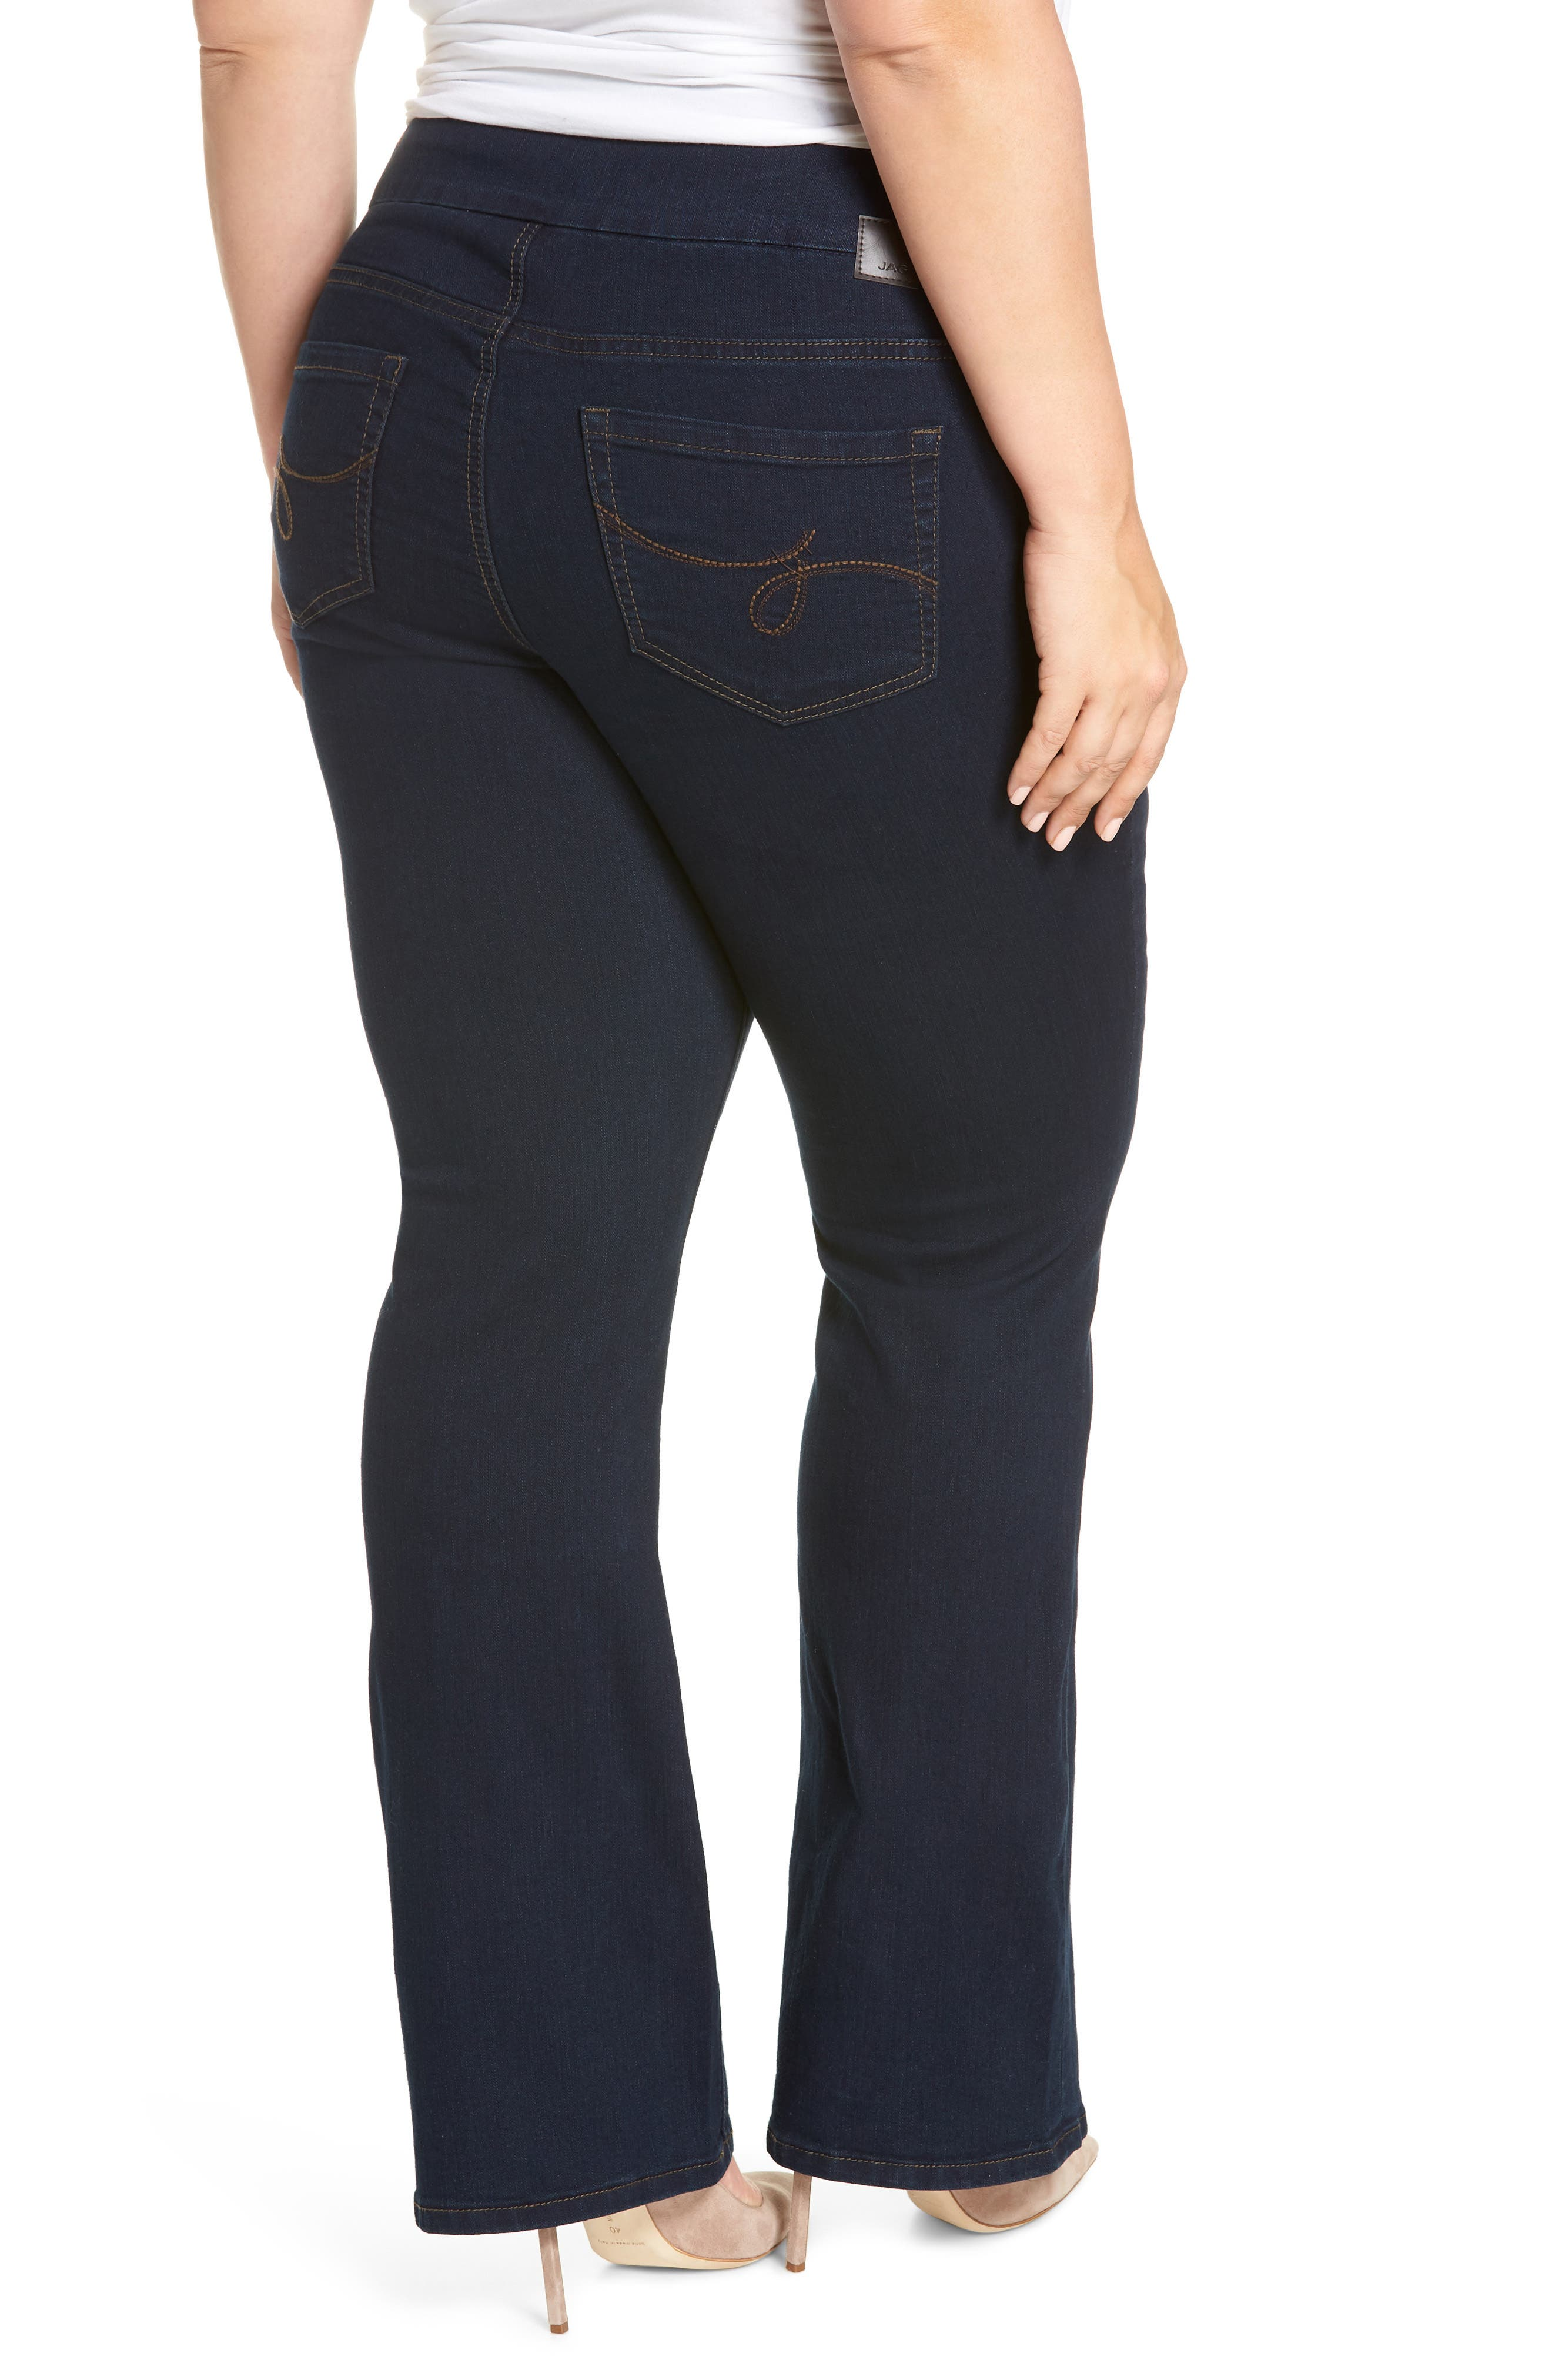 Peri Stretch Straight Leg Jeans,                             Alternate thumbnail 2, color,                             DARK INDIGO